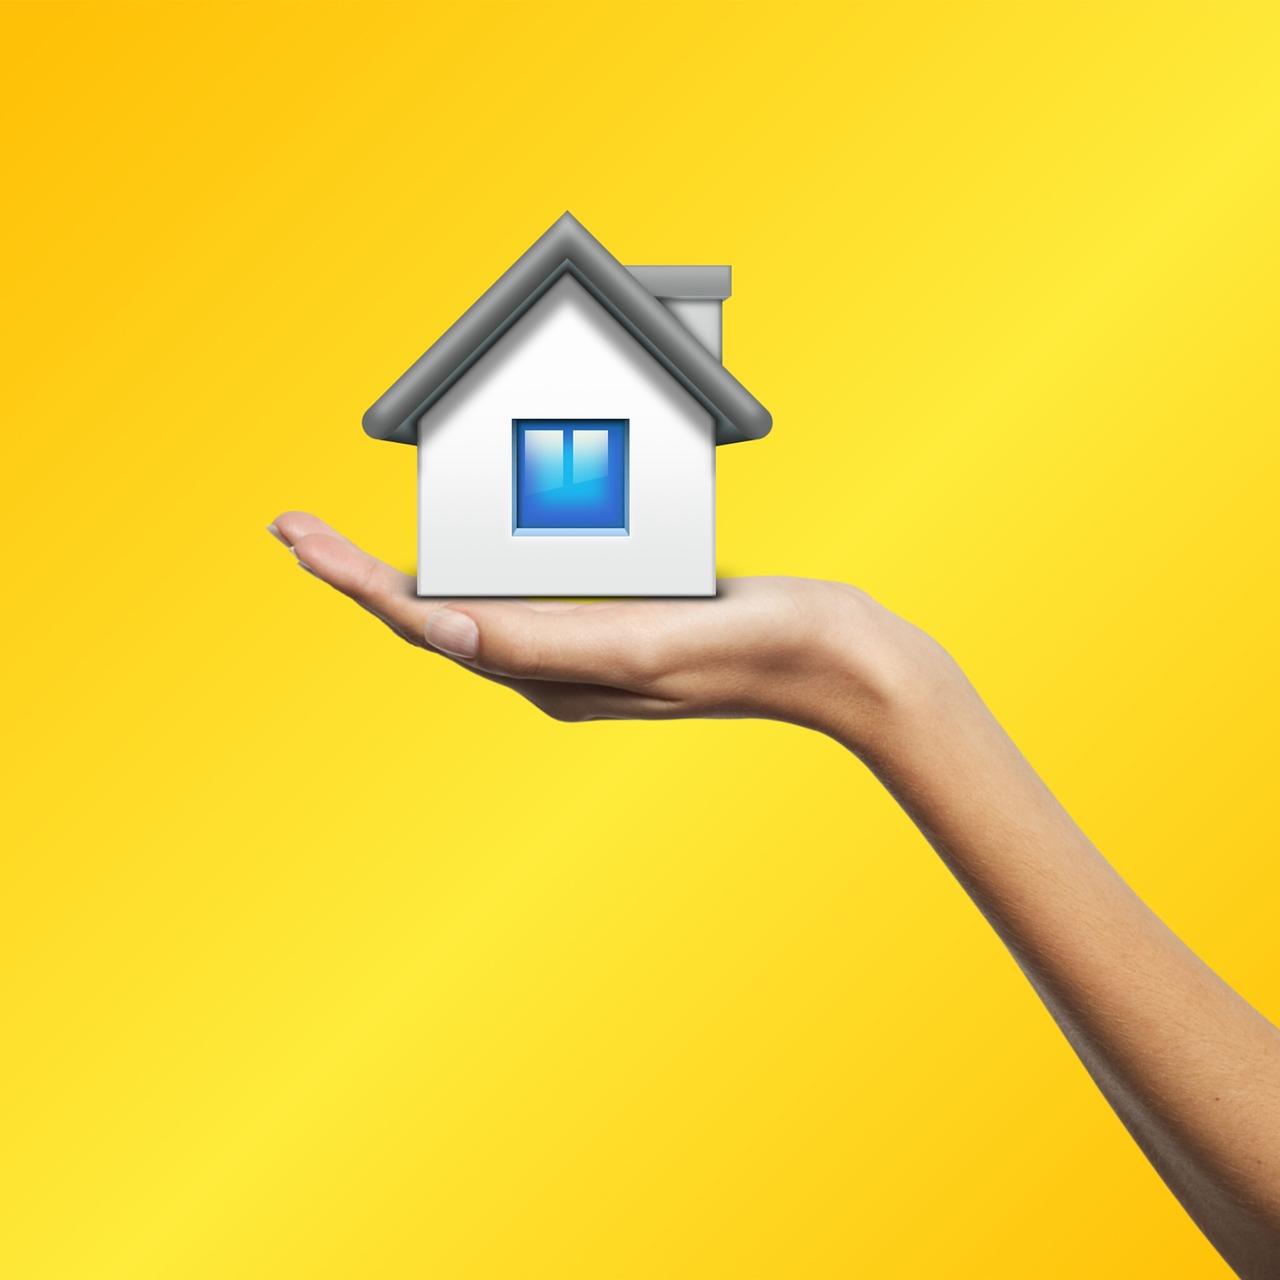 real-estate-2989820_1280